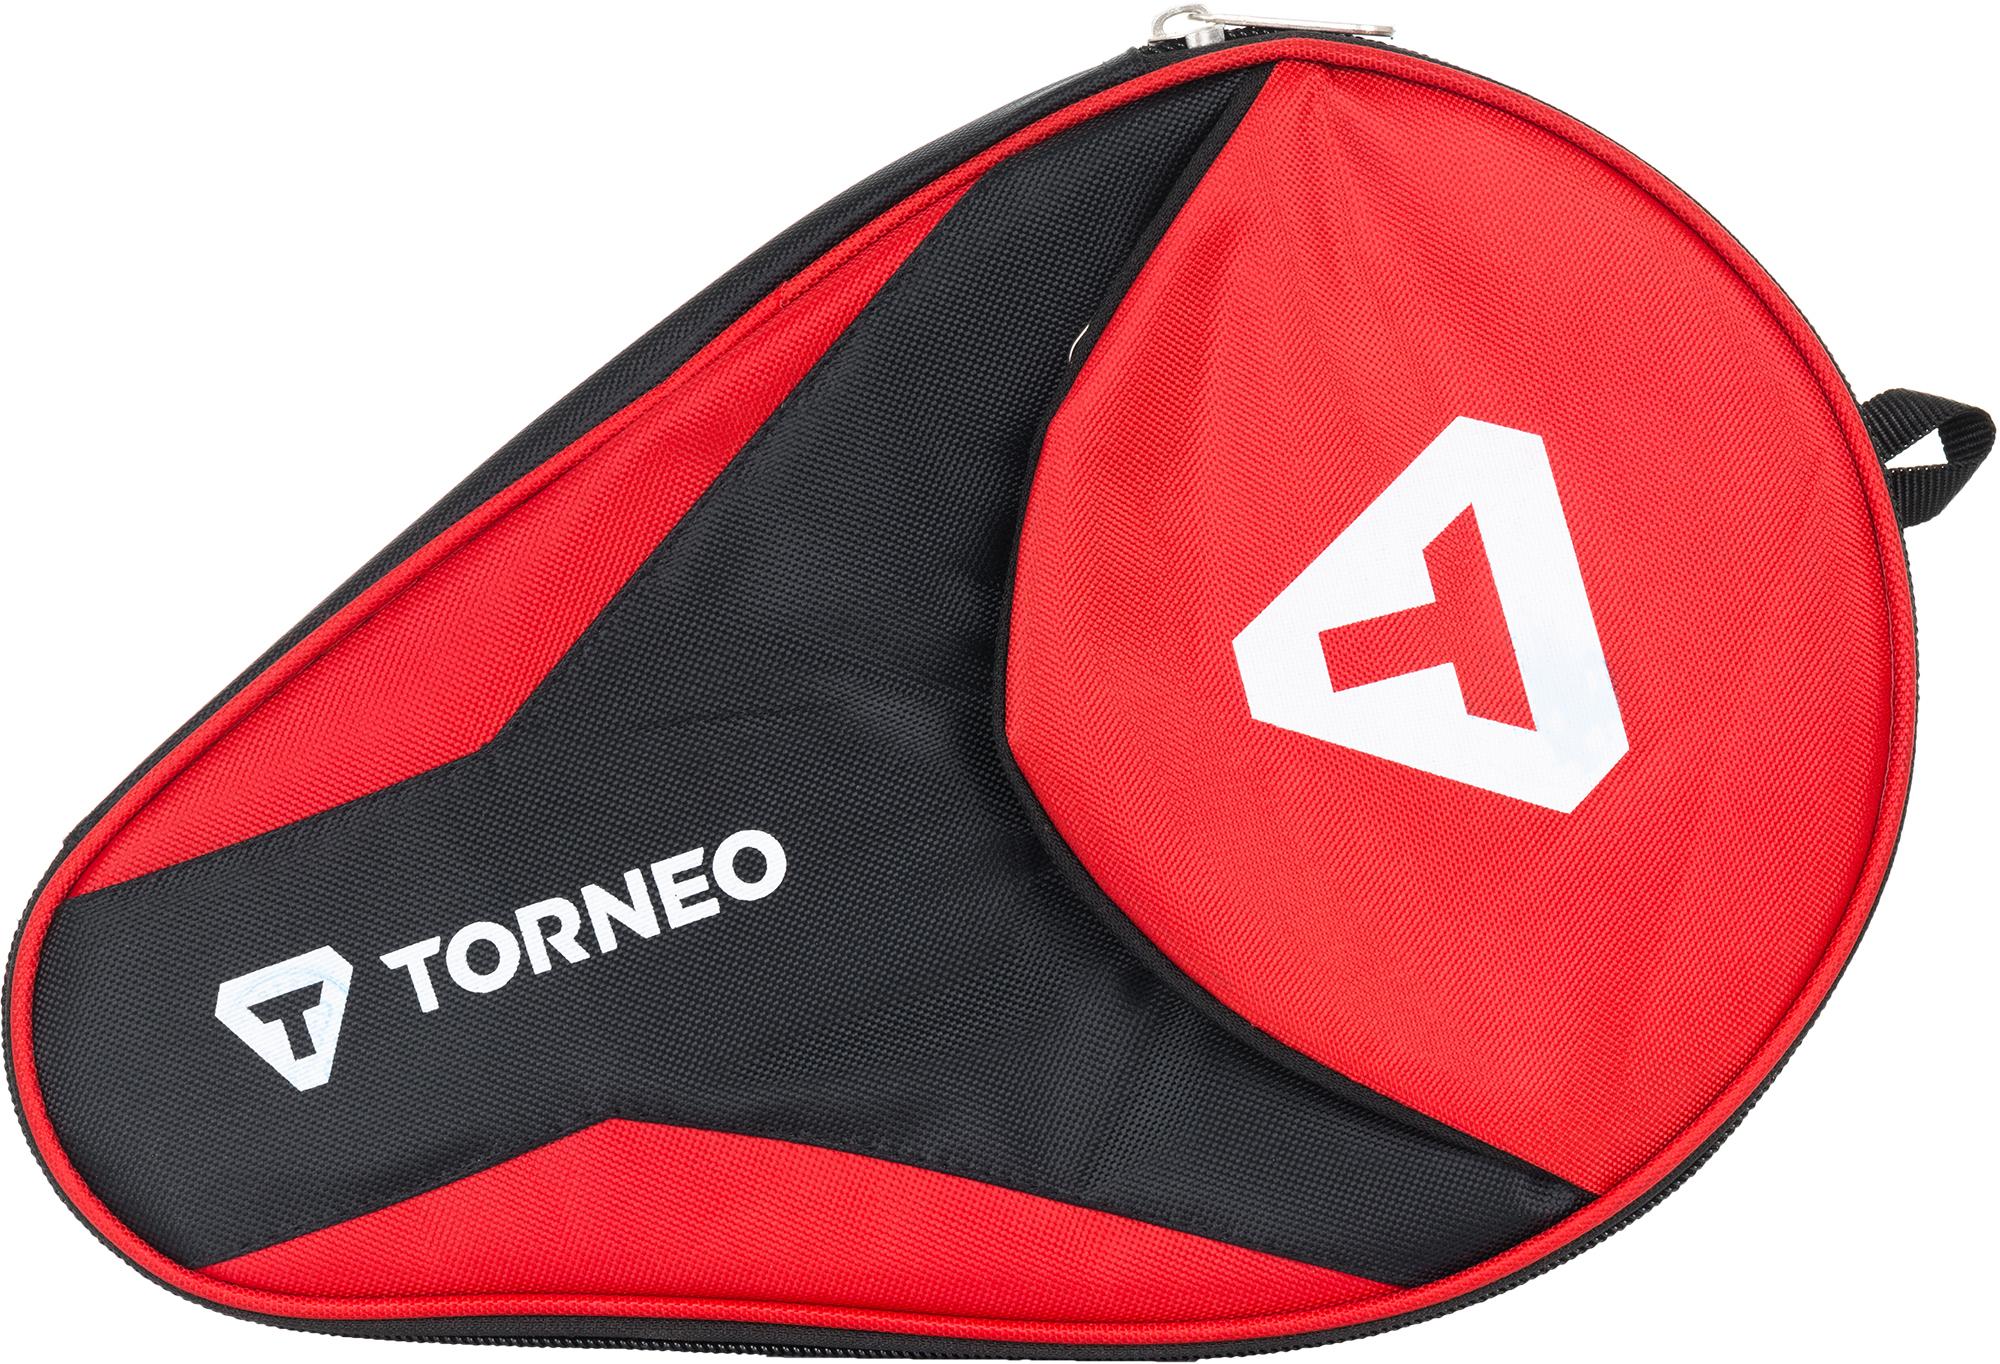 Torneo Чехол для 1 ракетки для настольного тенниса Torneo цена